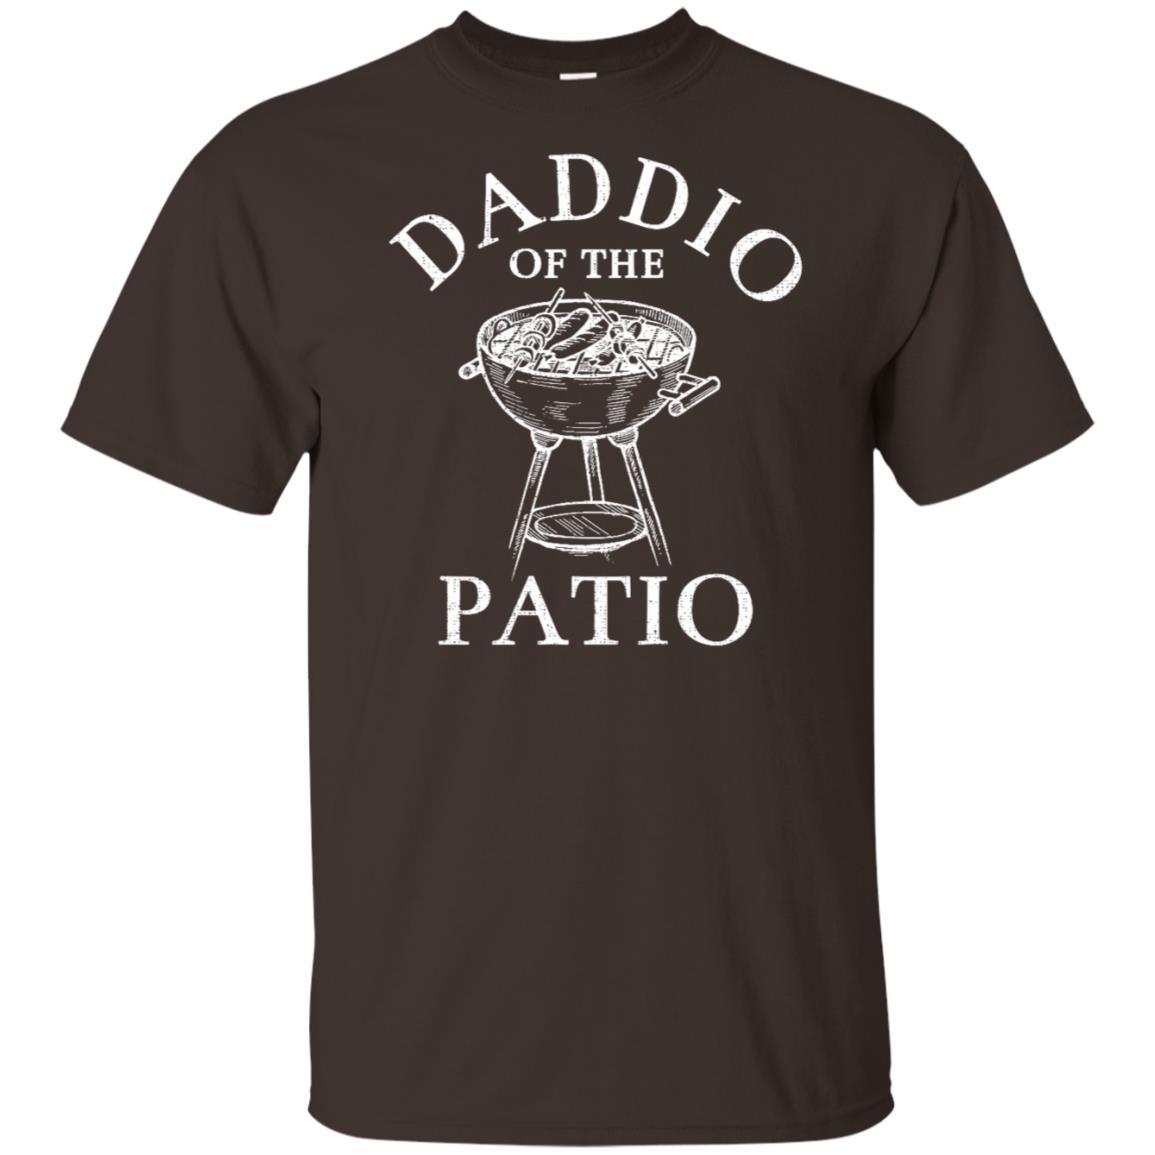 Daddio of the Patio Spatula Tee-1 Unisex Short Sleeve